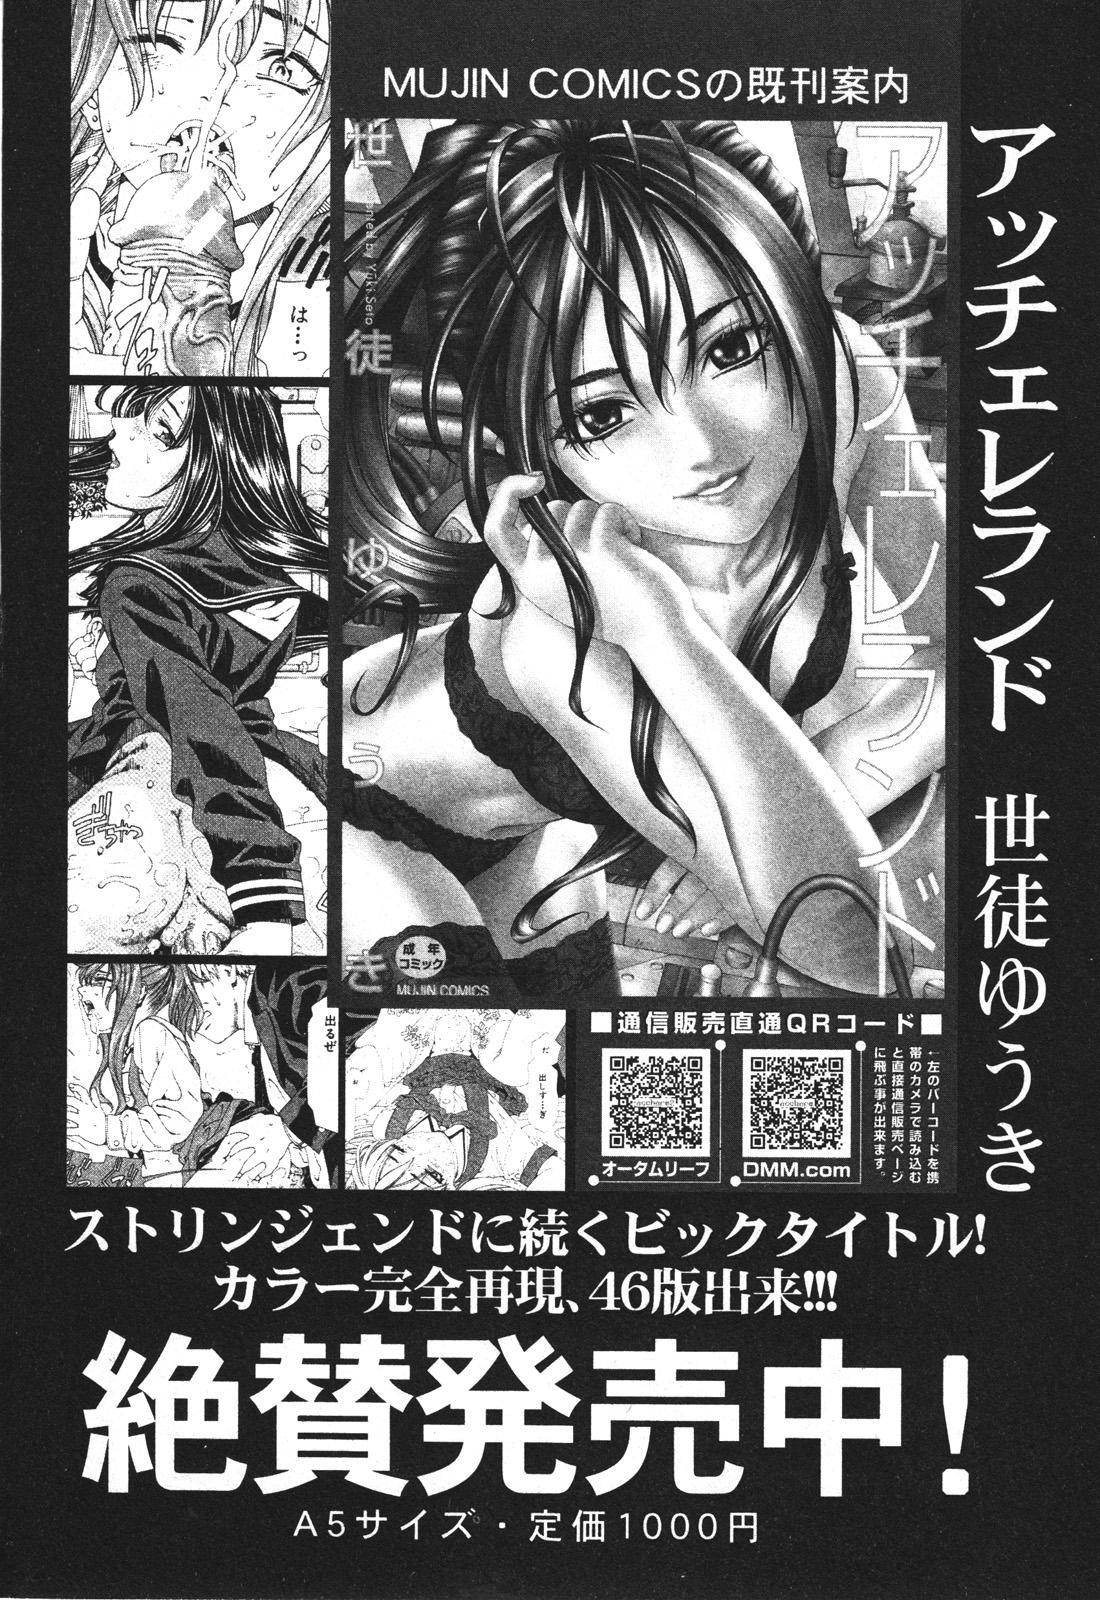 BUSTER COMIC 2010-05 Vol.07 346